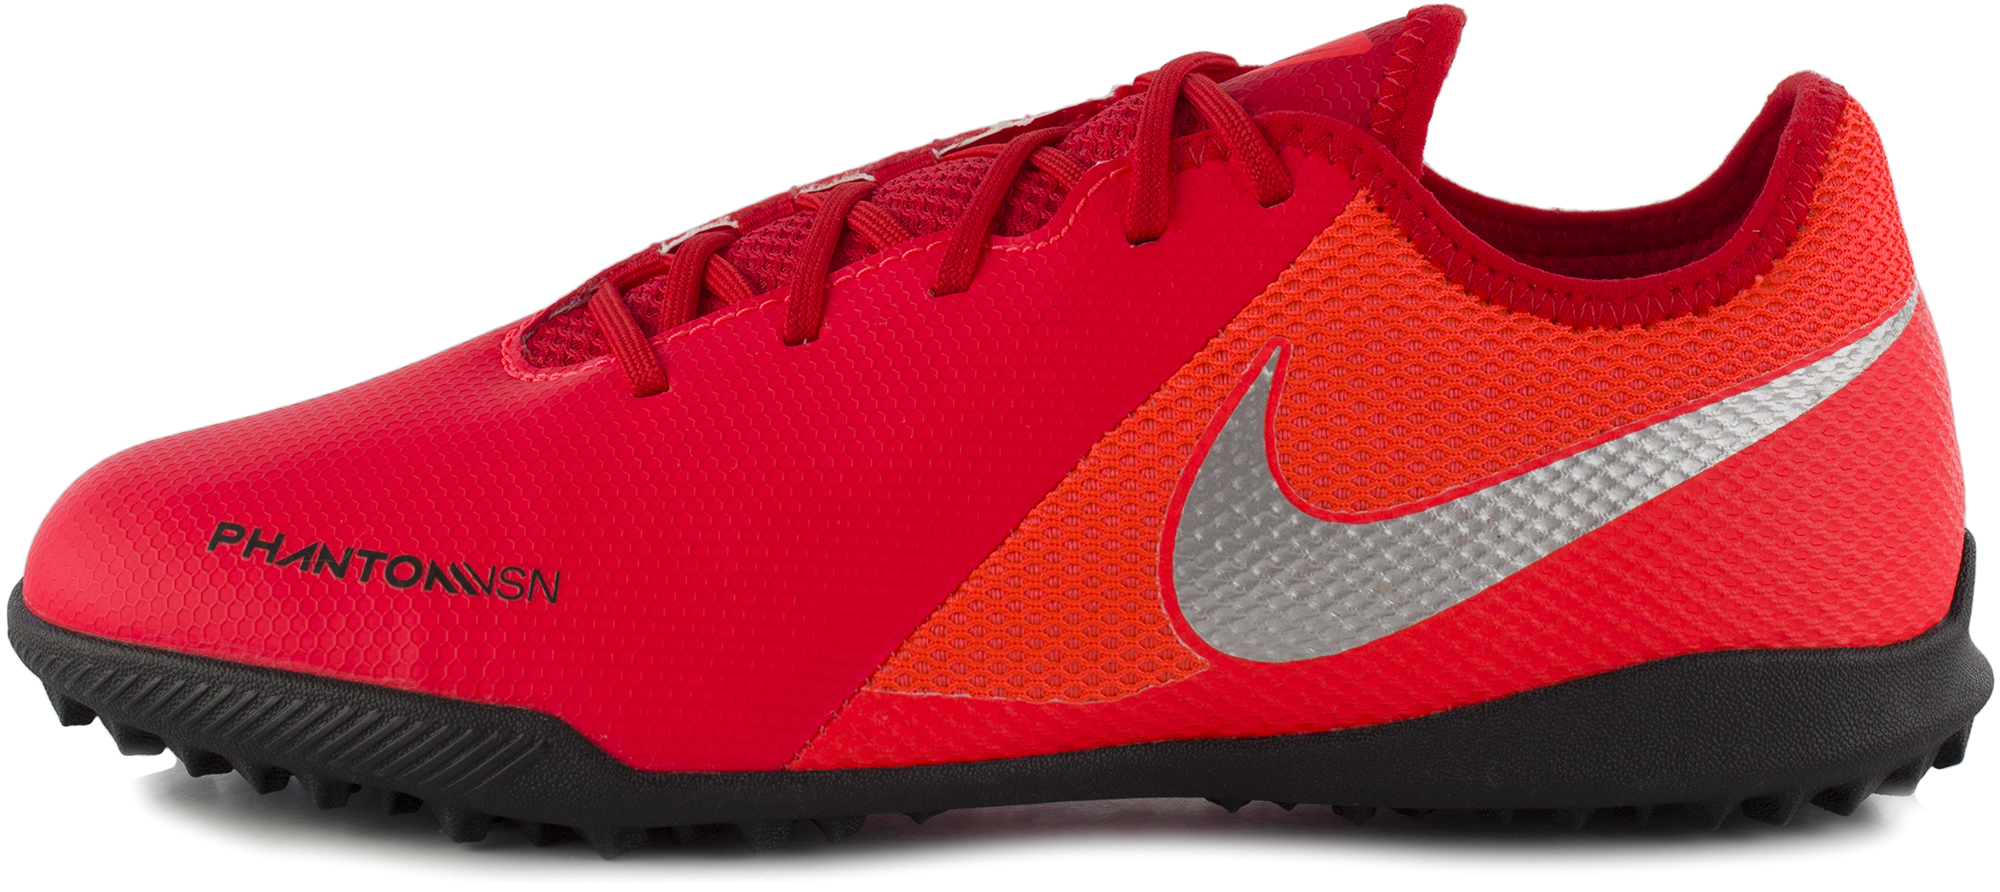 Nike Бутсы для мальчиков Nike Phantom Vsn Academy TF, размер 37,5